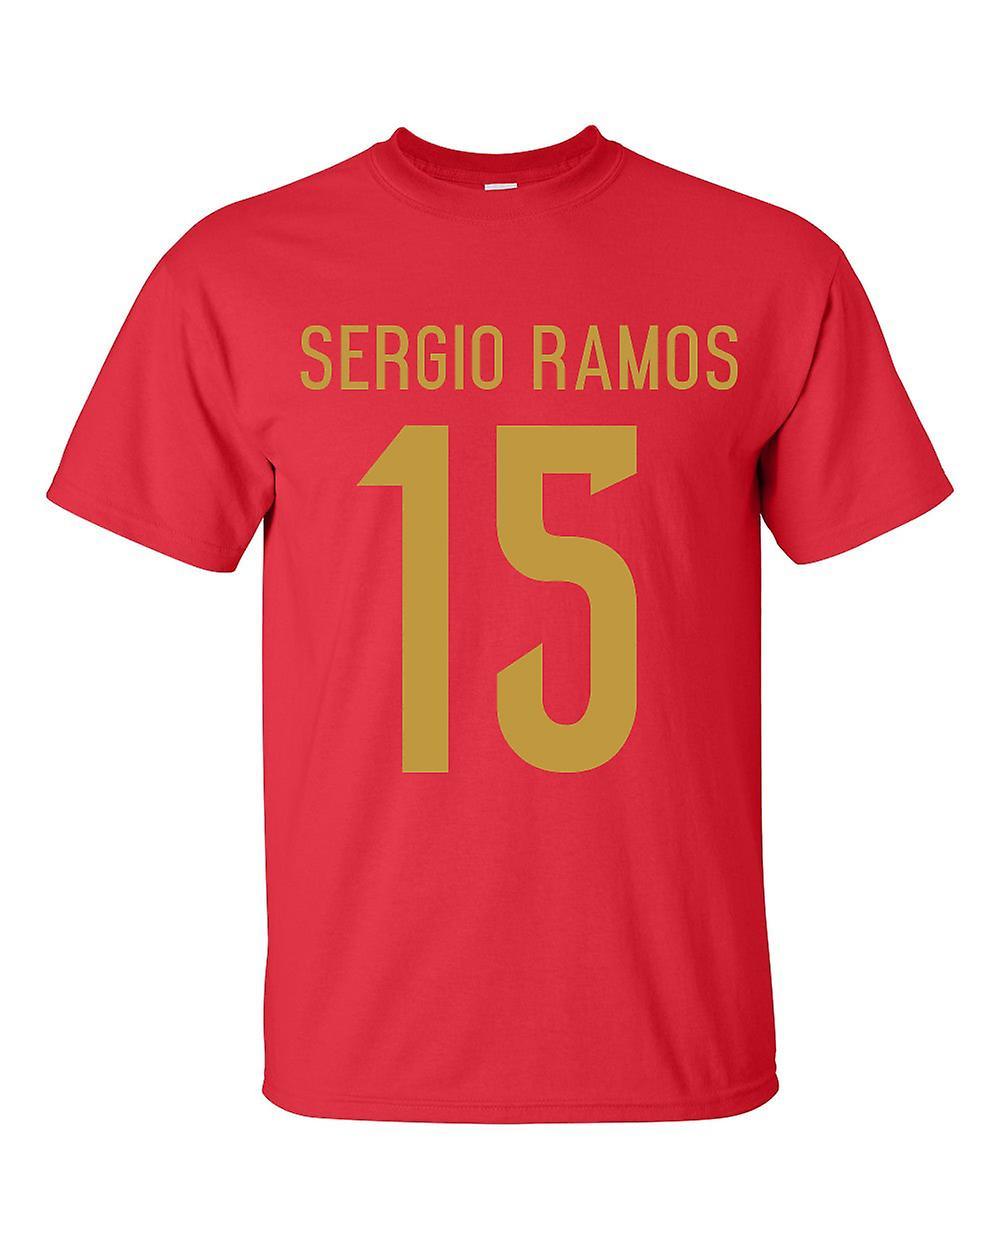 Sergio Ramos Spain Hero T-shirt (red)